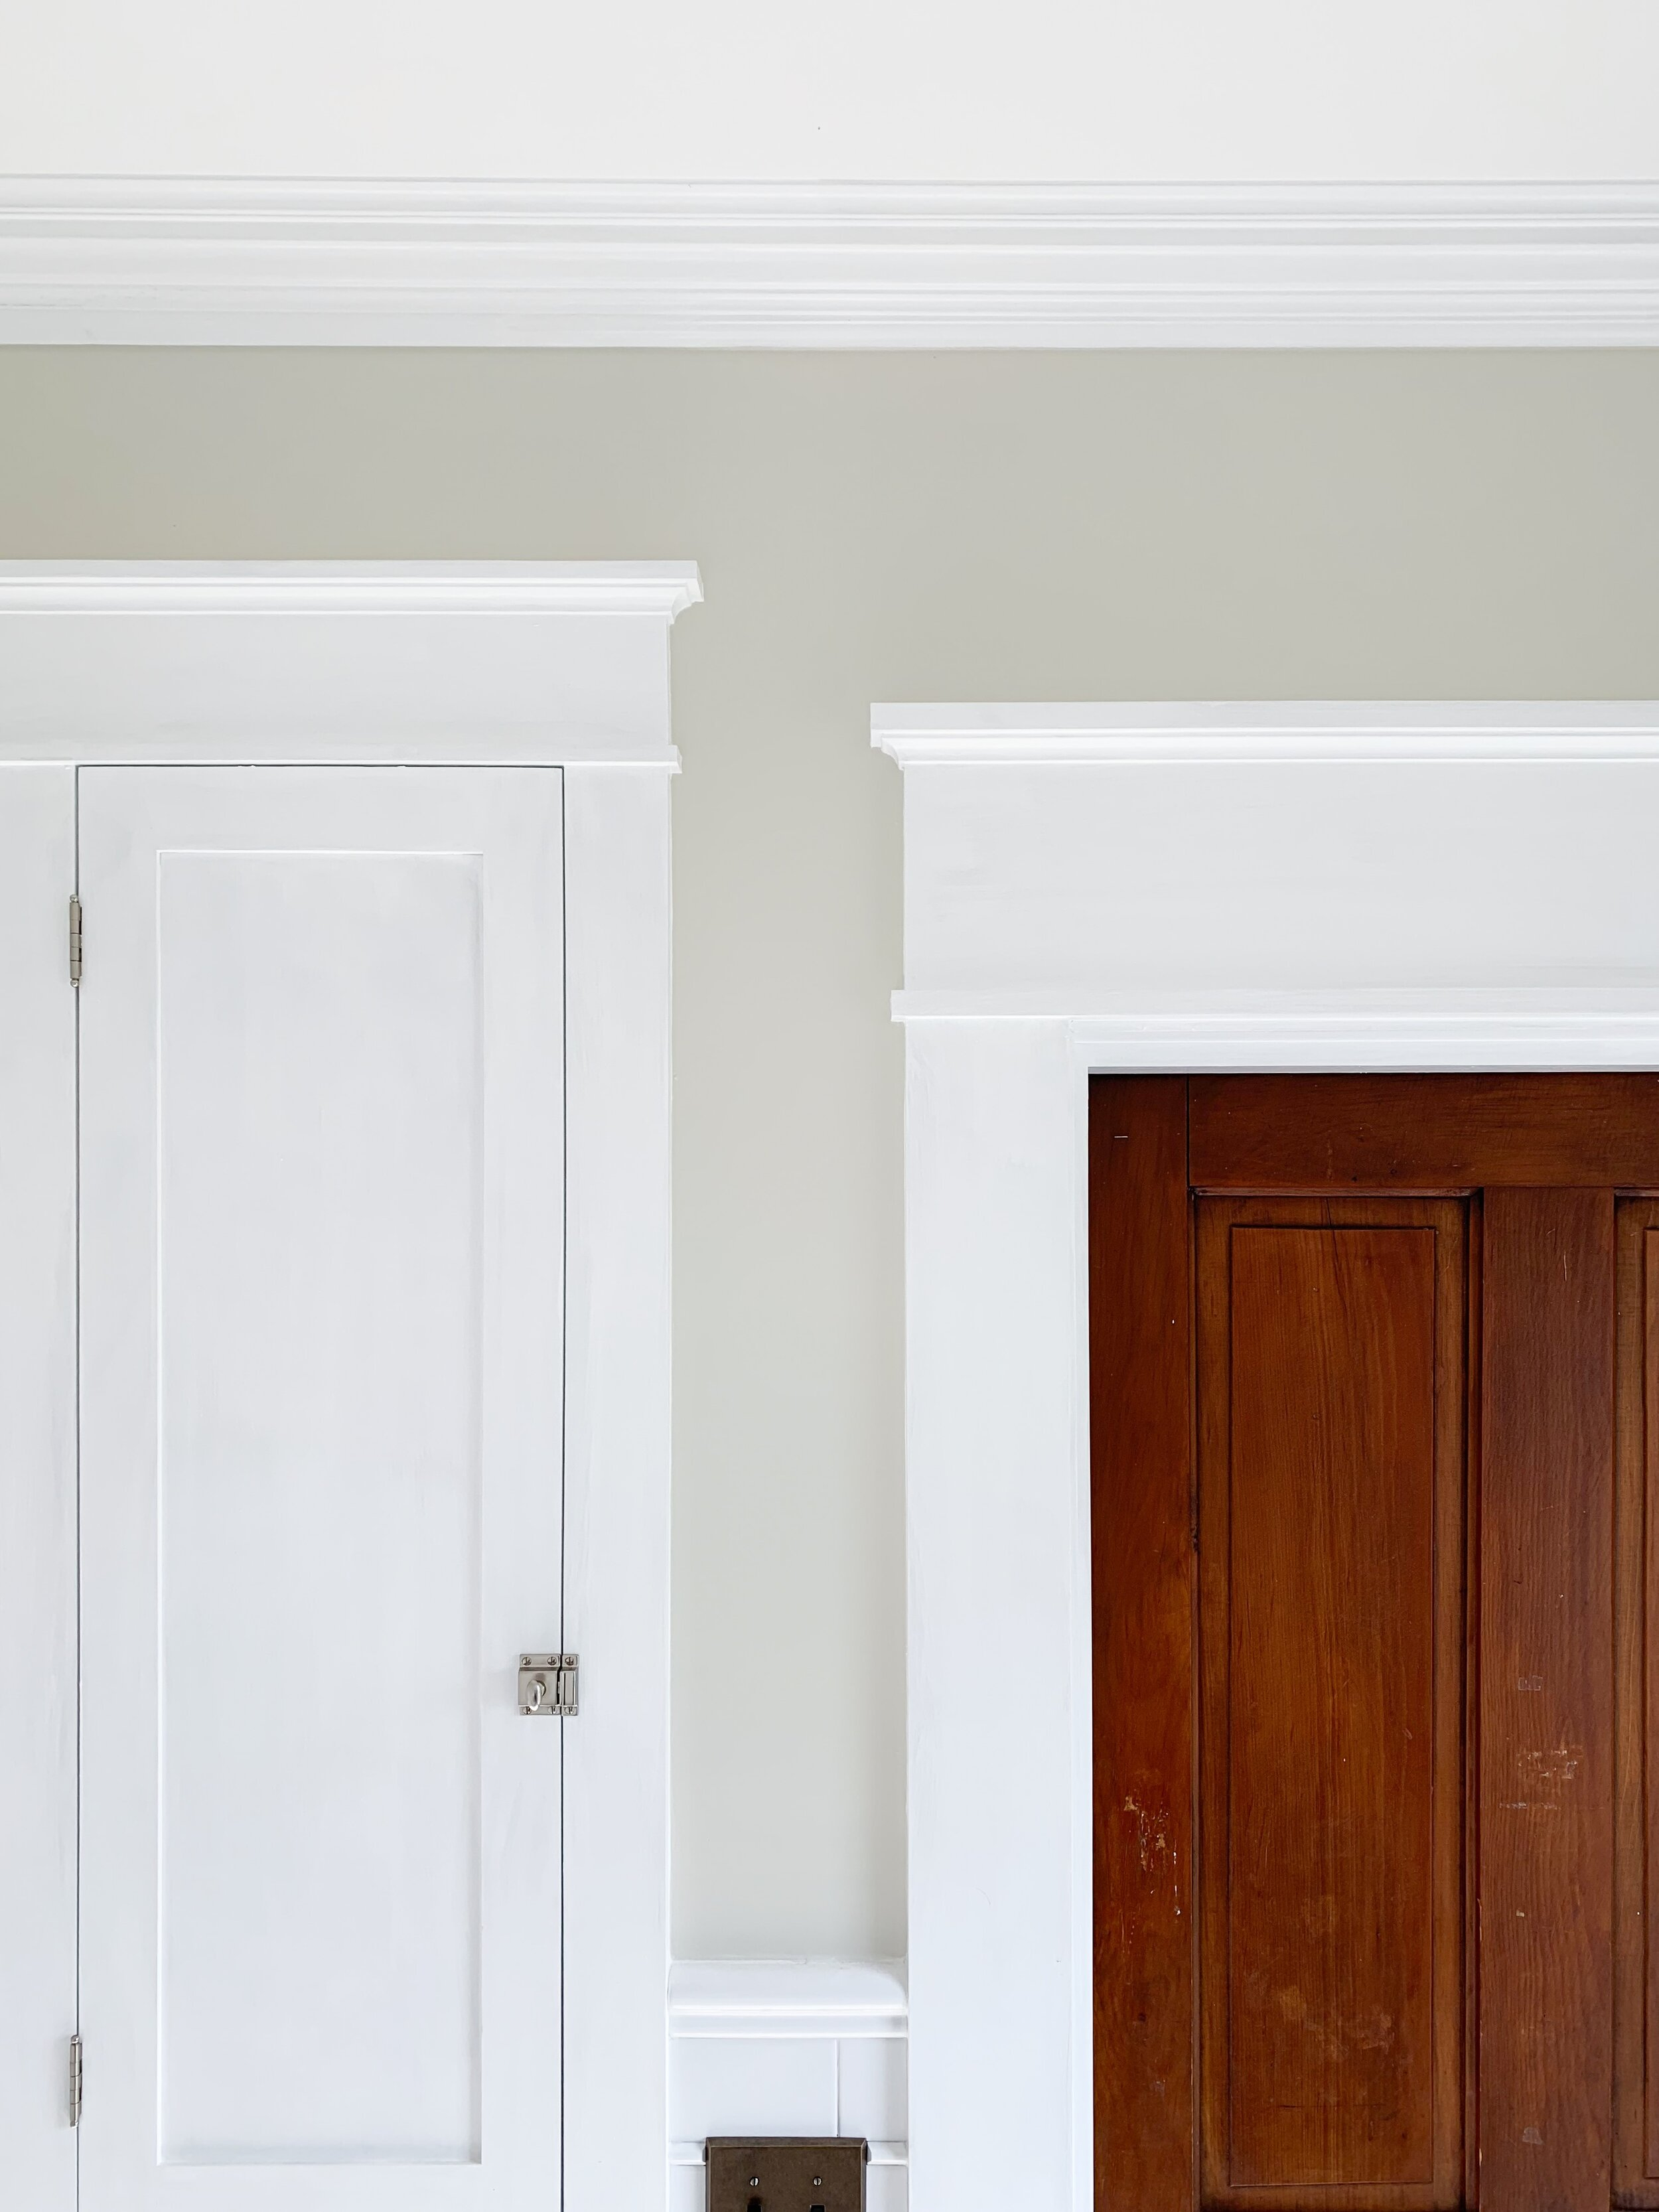 Walls: Matte Behr Premium Plus Ultra - Prairie Dust Ceiling: Flat Behr Premium Plus Ceiling - Ultra Pure White Trim: Semi-gloss Behr Premium Plus Ultra - Ultra Pure White